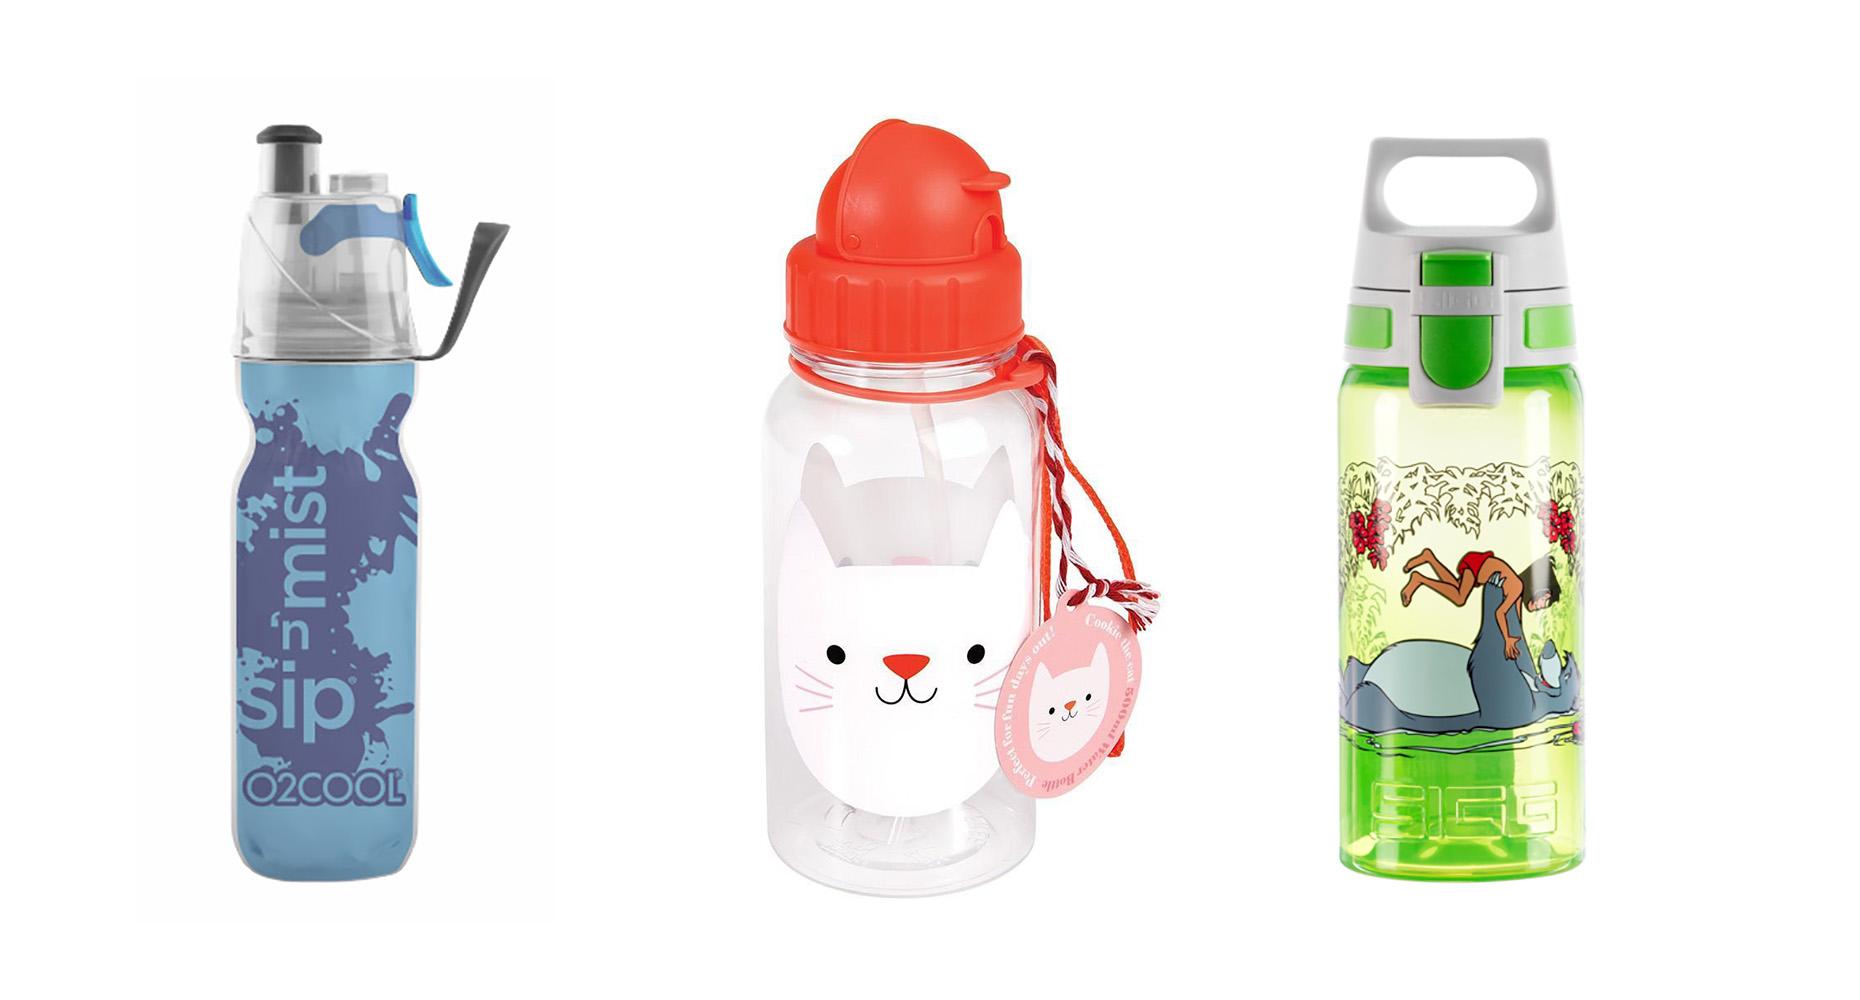 Fun water bottles to keep kids hydrated